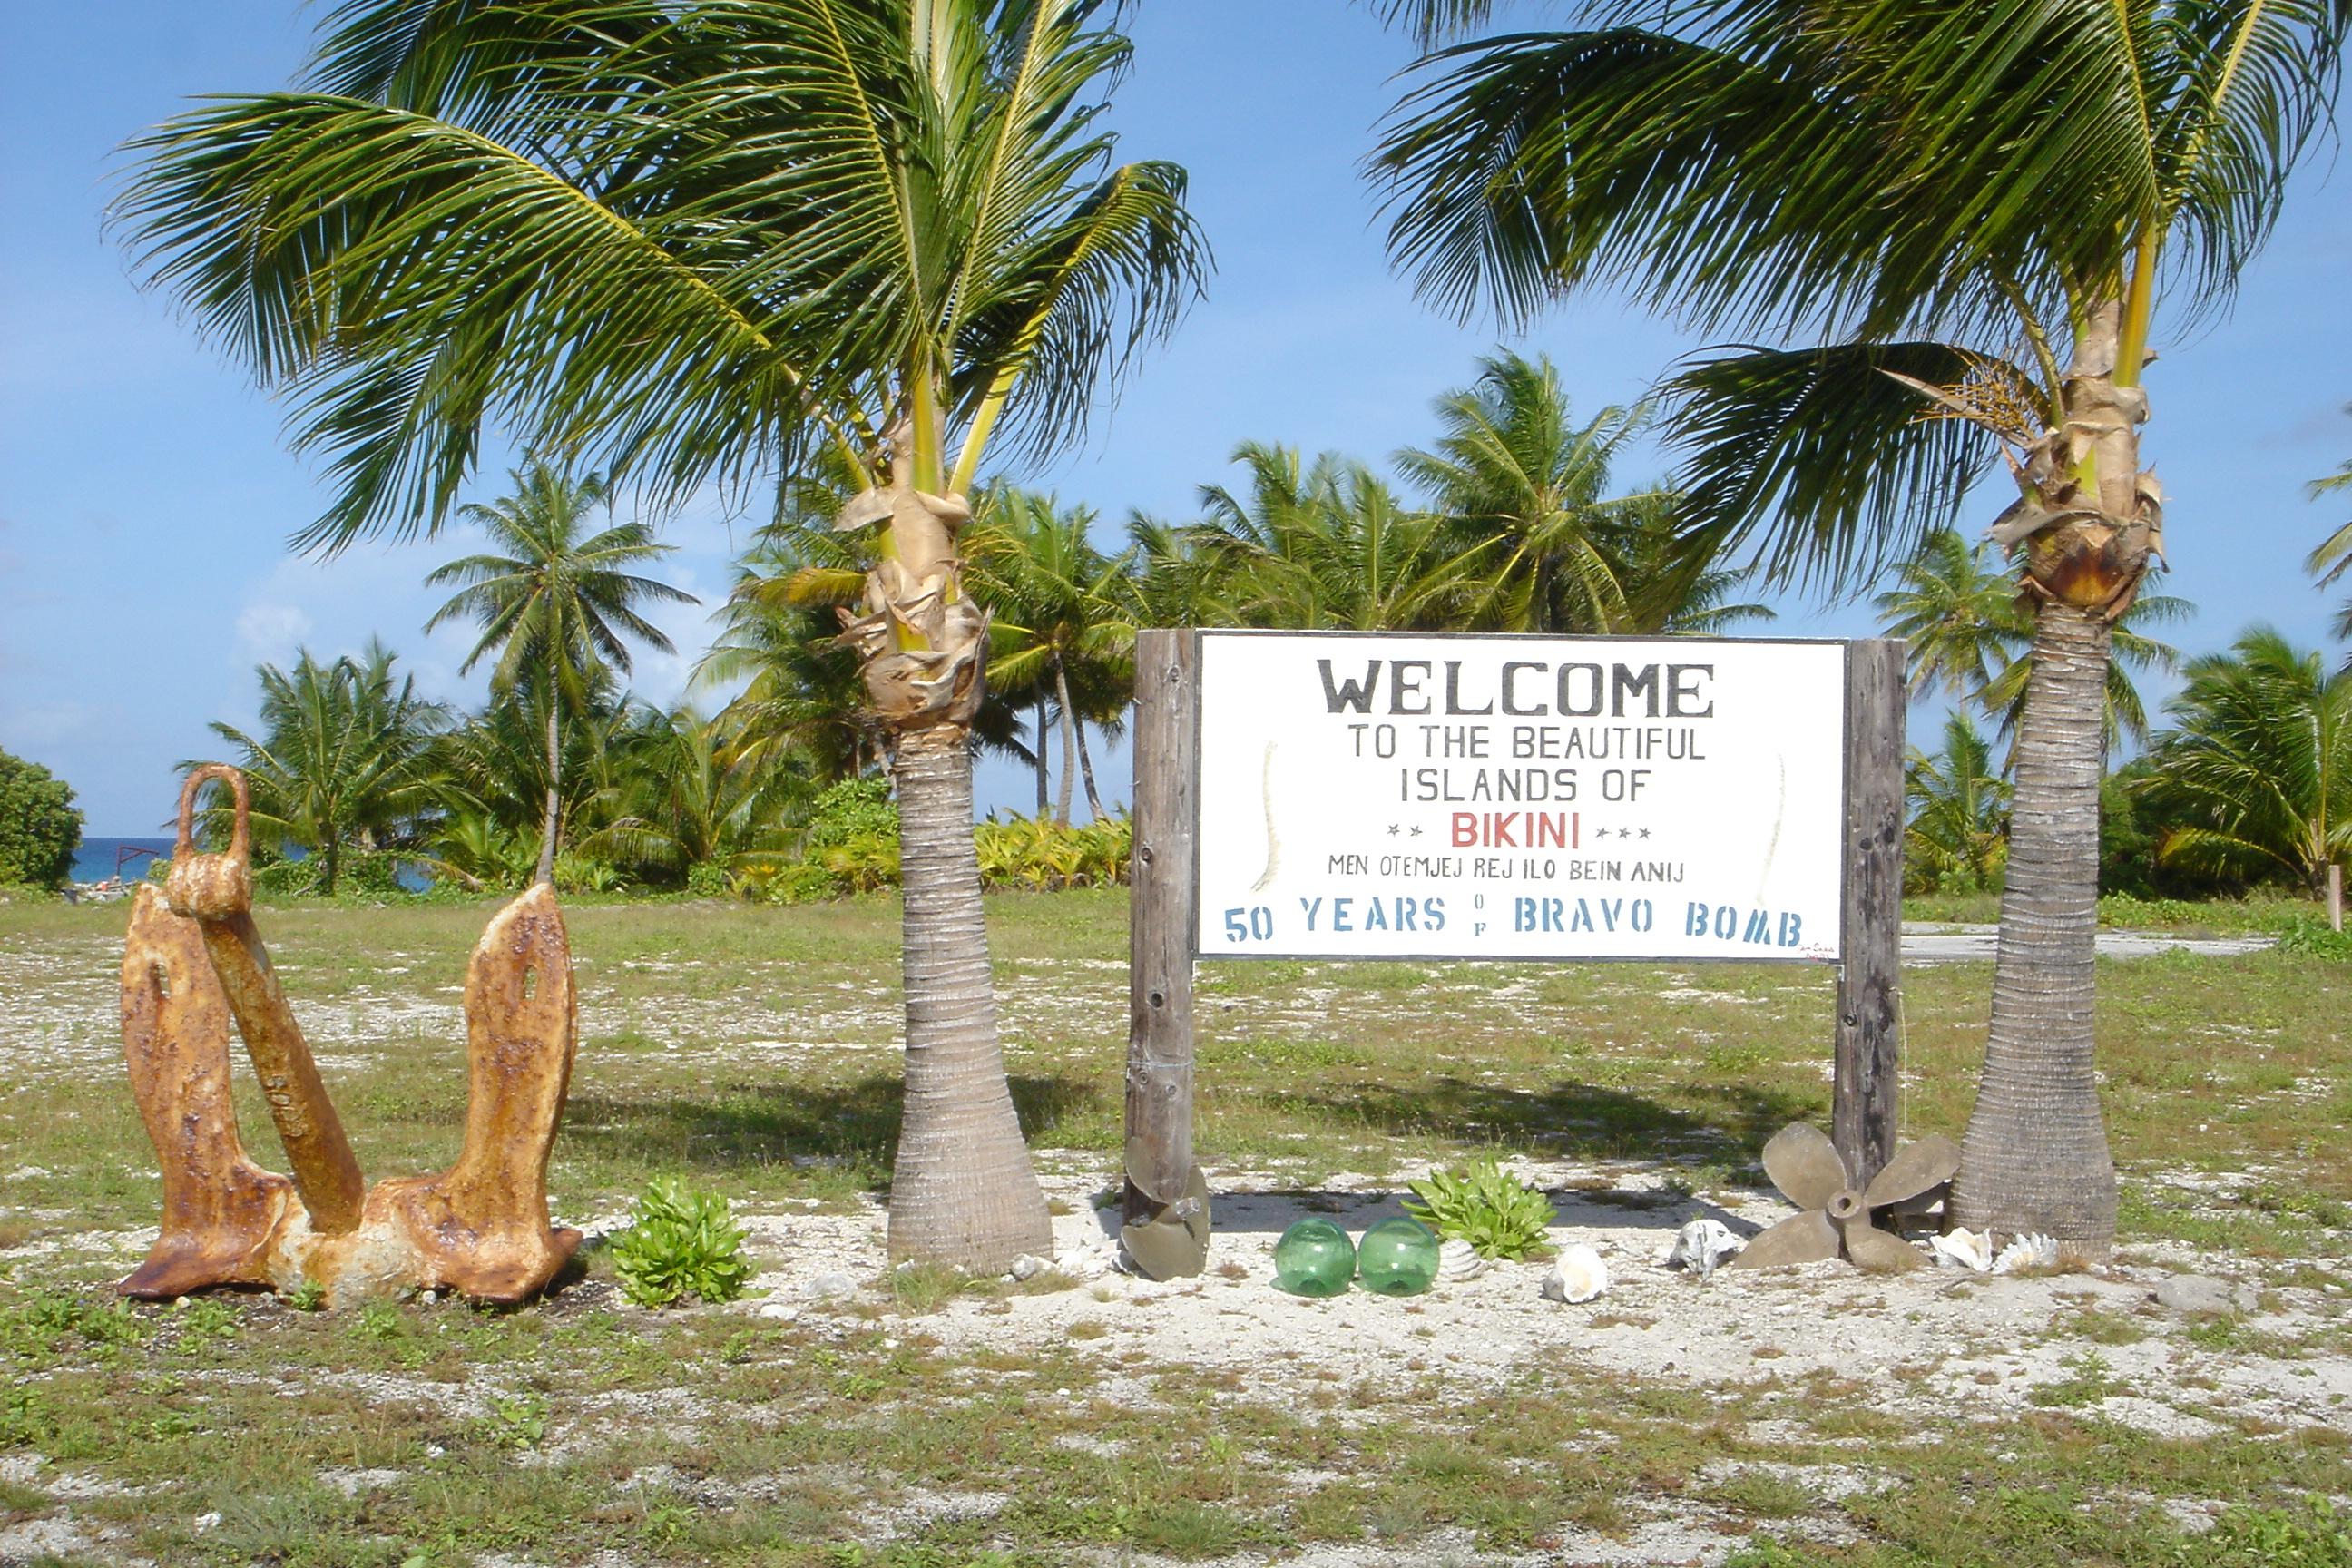 Bikini atoll test site